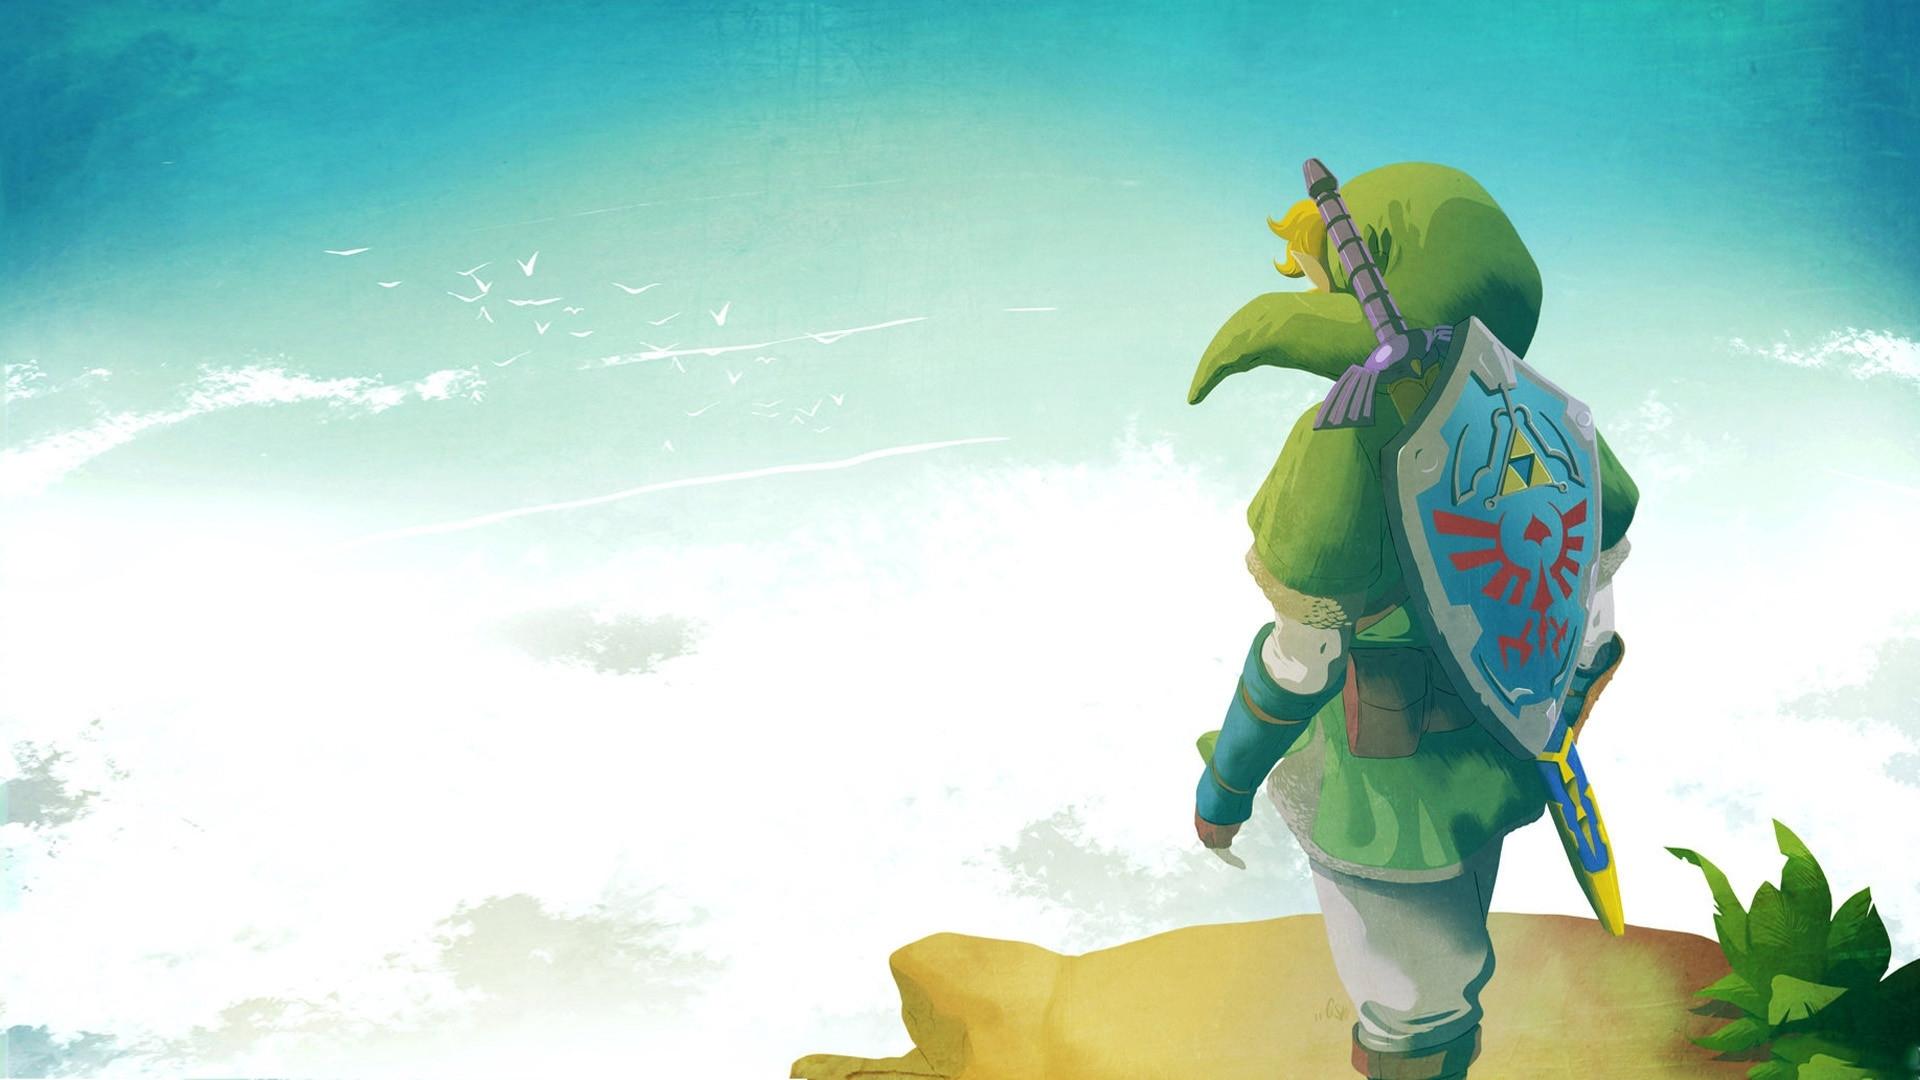 the legend of zelda: skyward sword full hd wallpaper and background